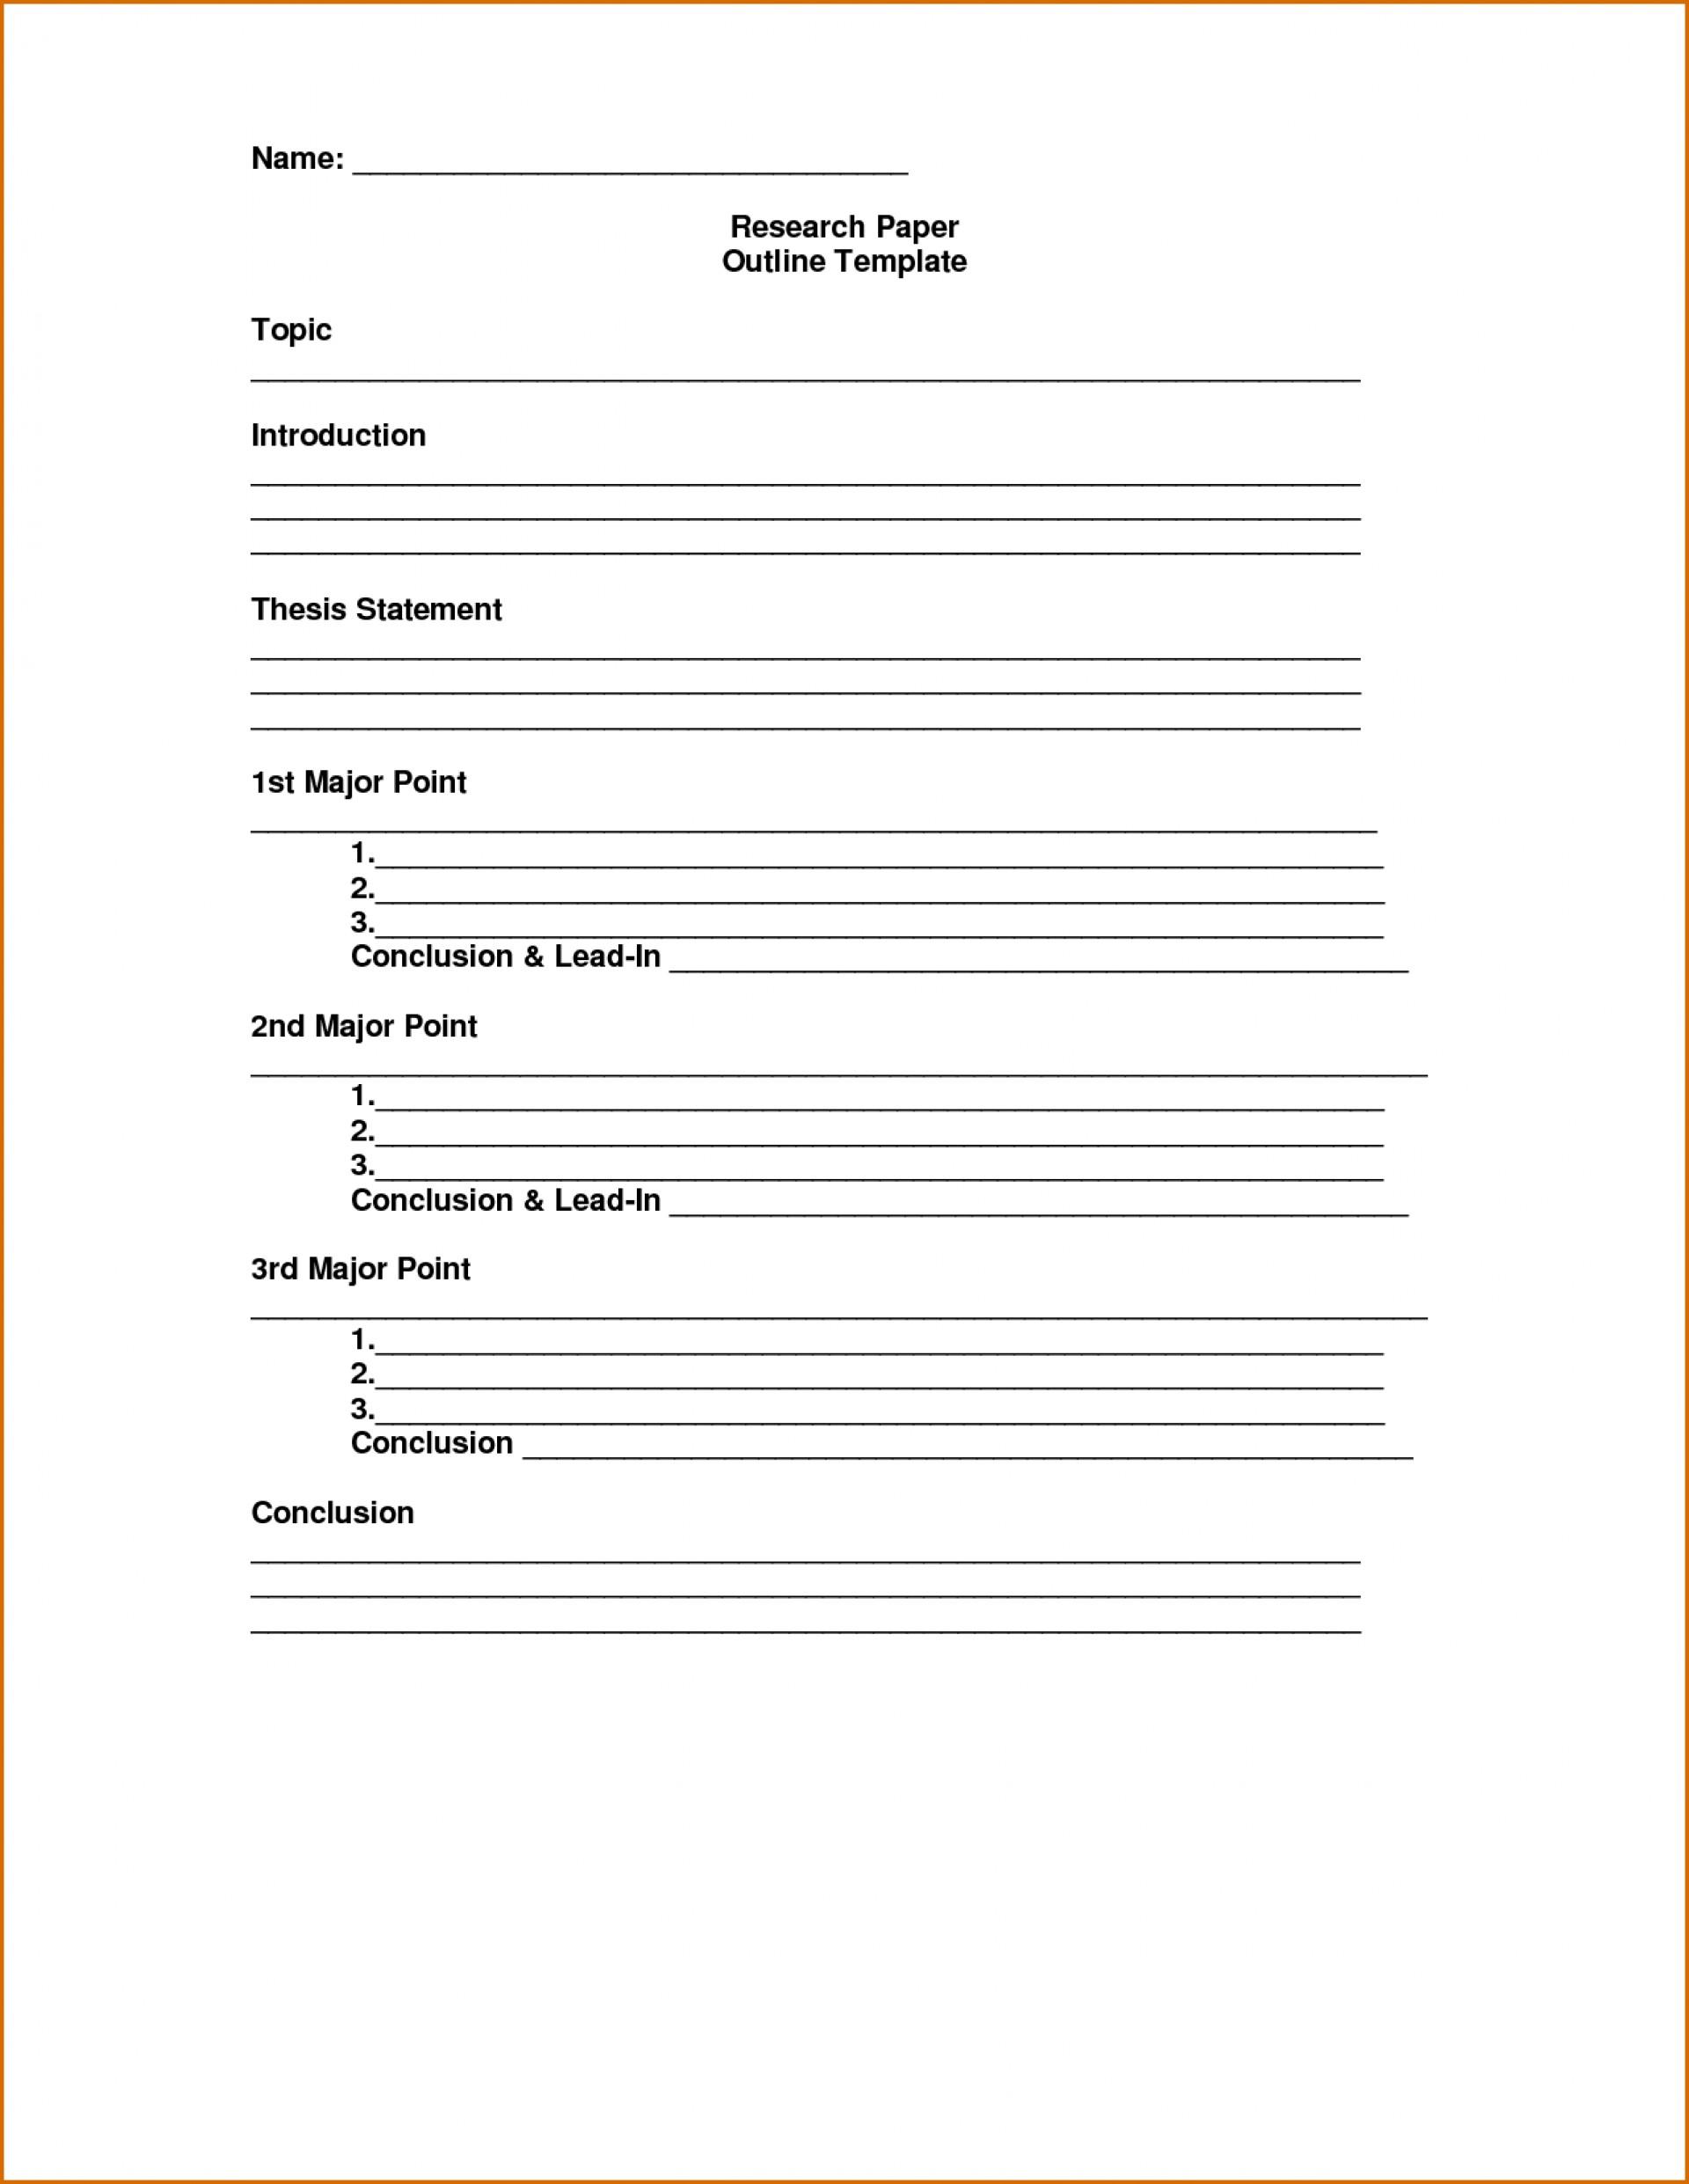 005 Essay Outline Template Excellent Mla Argumentative High School Research Paper Pdf 1920